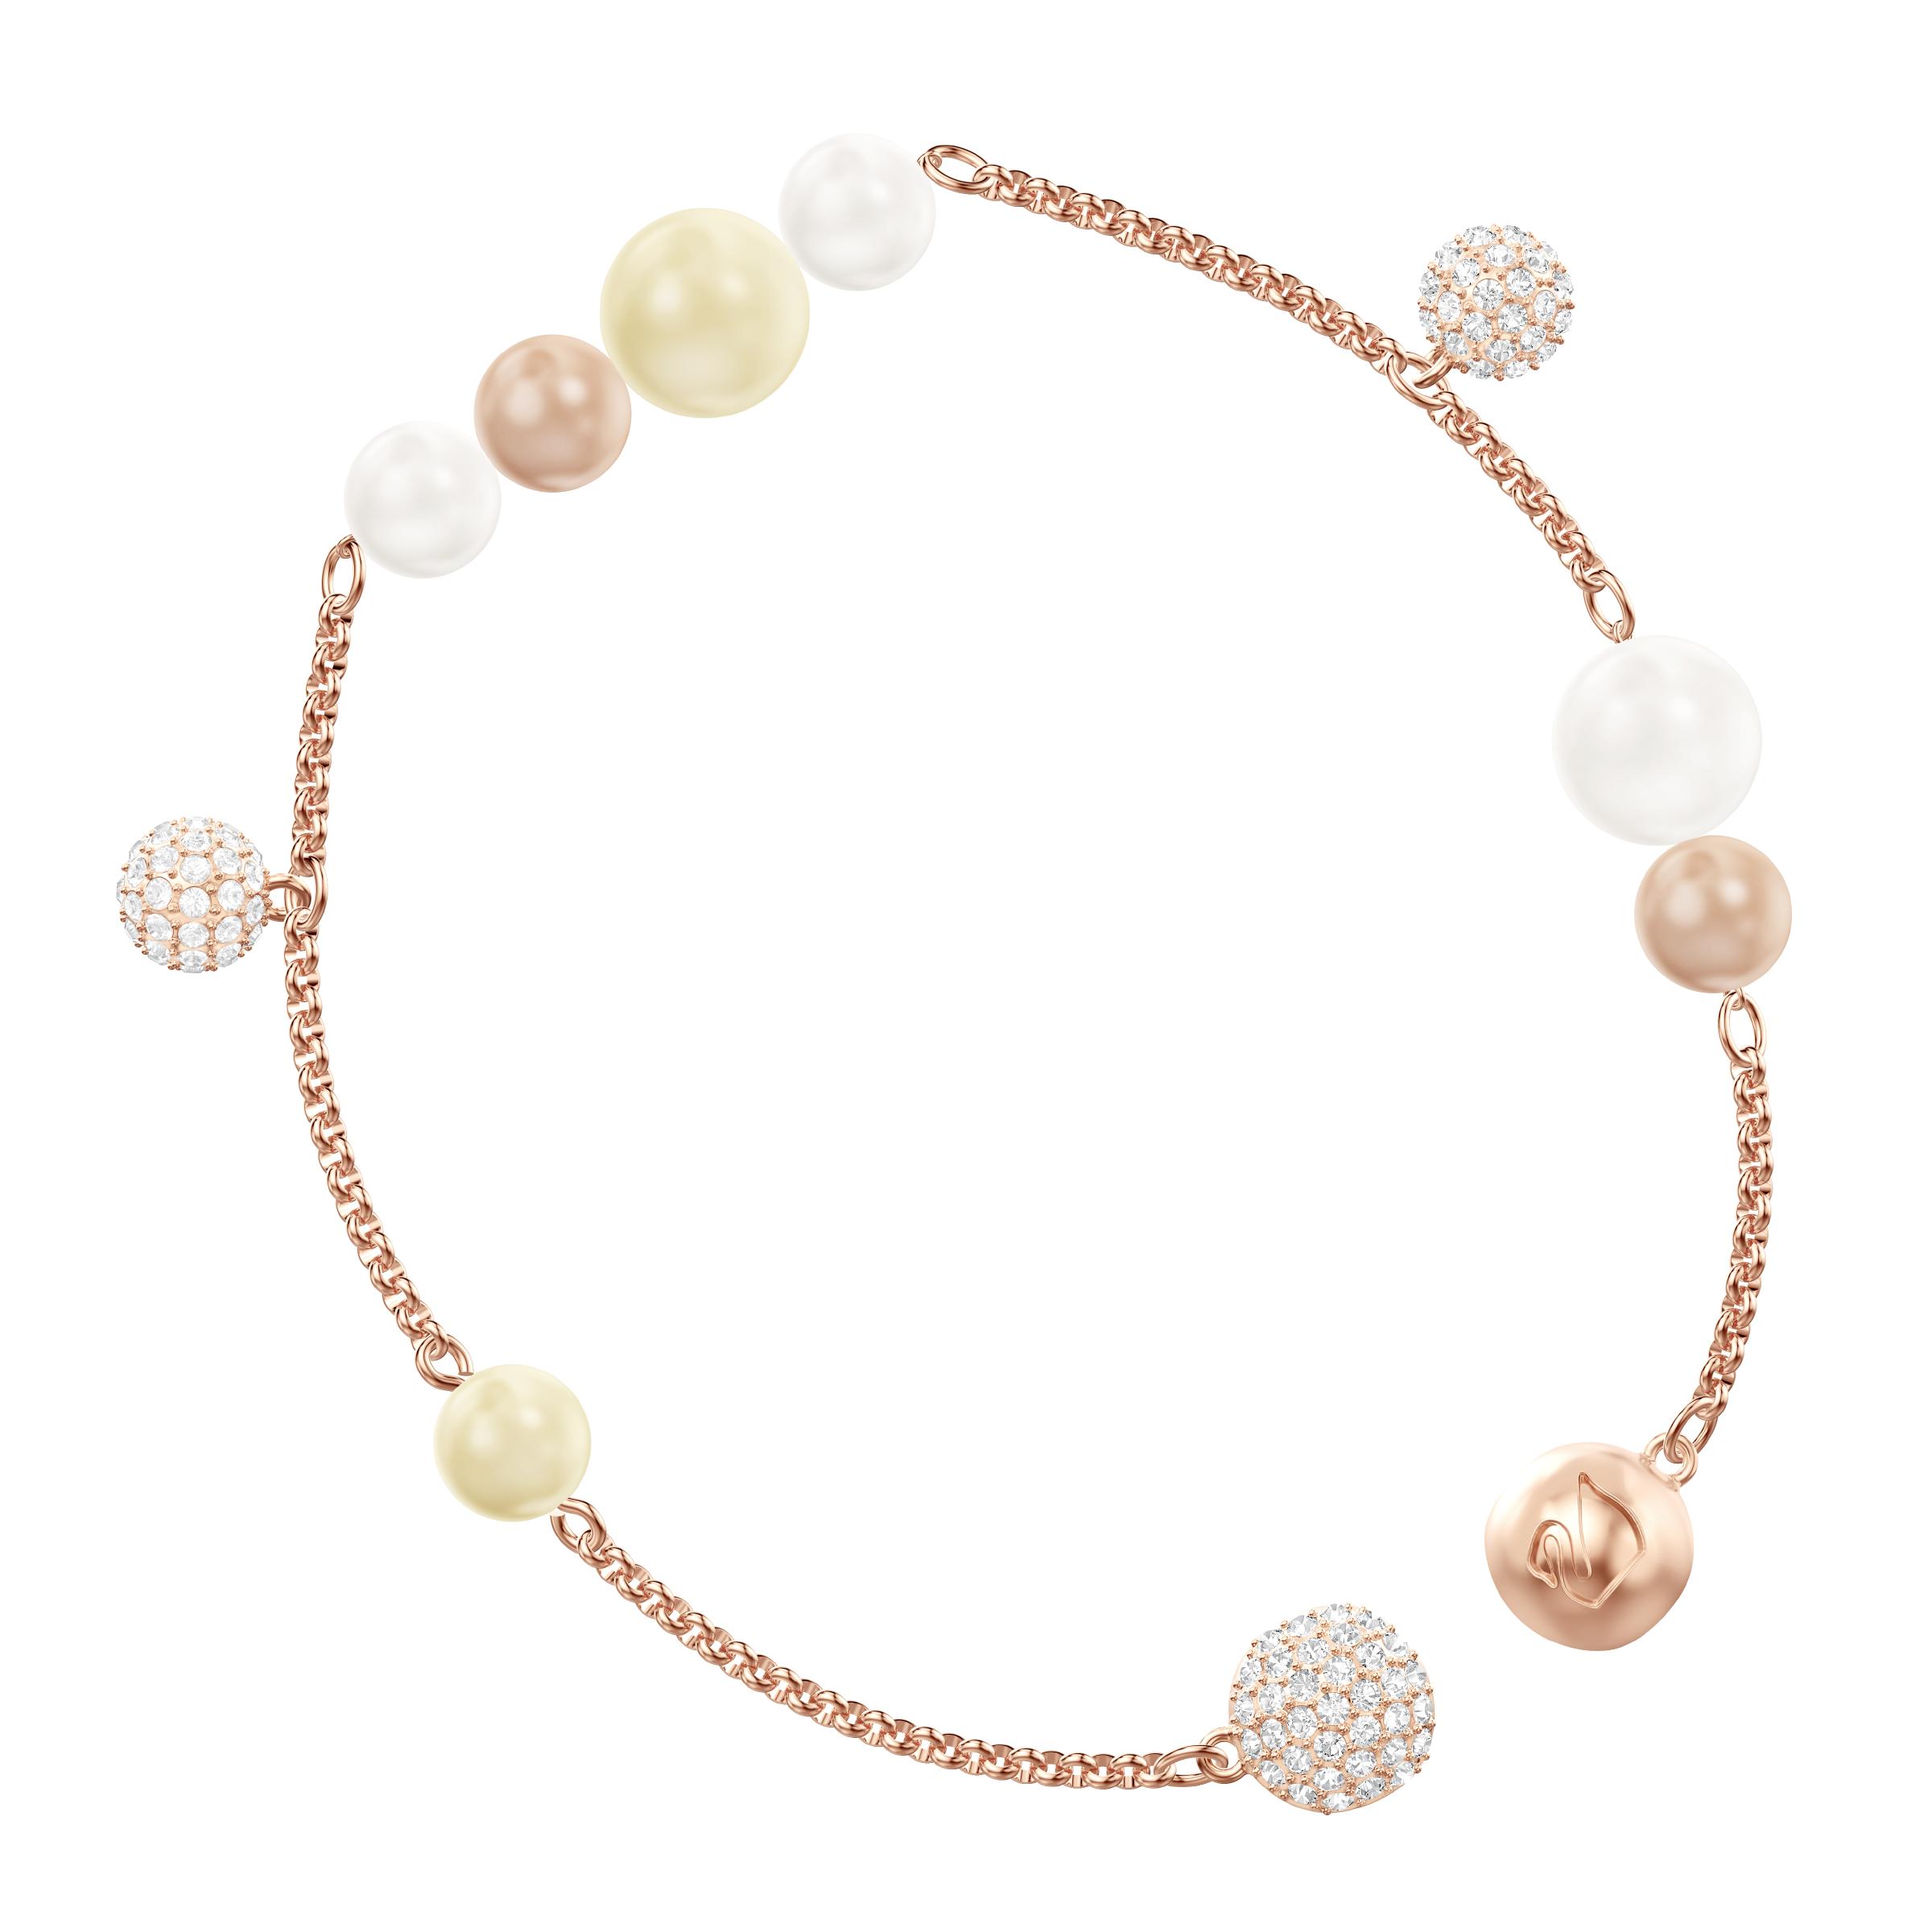 Swarovski Remix Collection Pearl Strand, Medium, Multi-colored, Rose gold plating